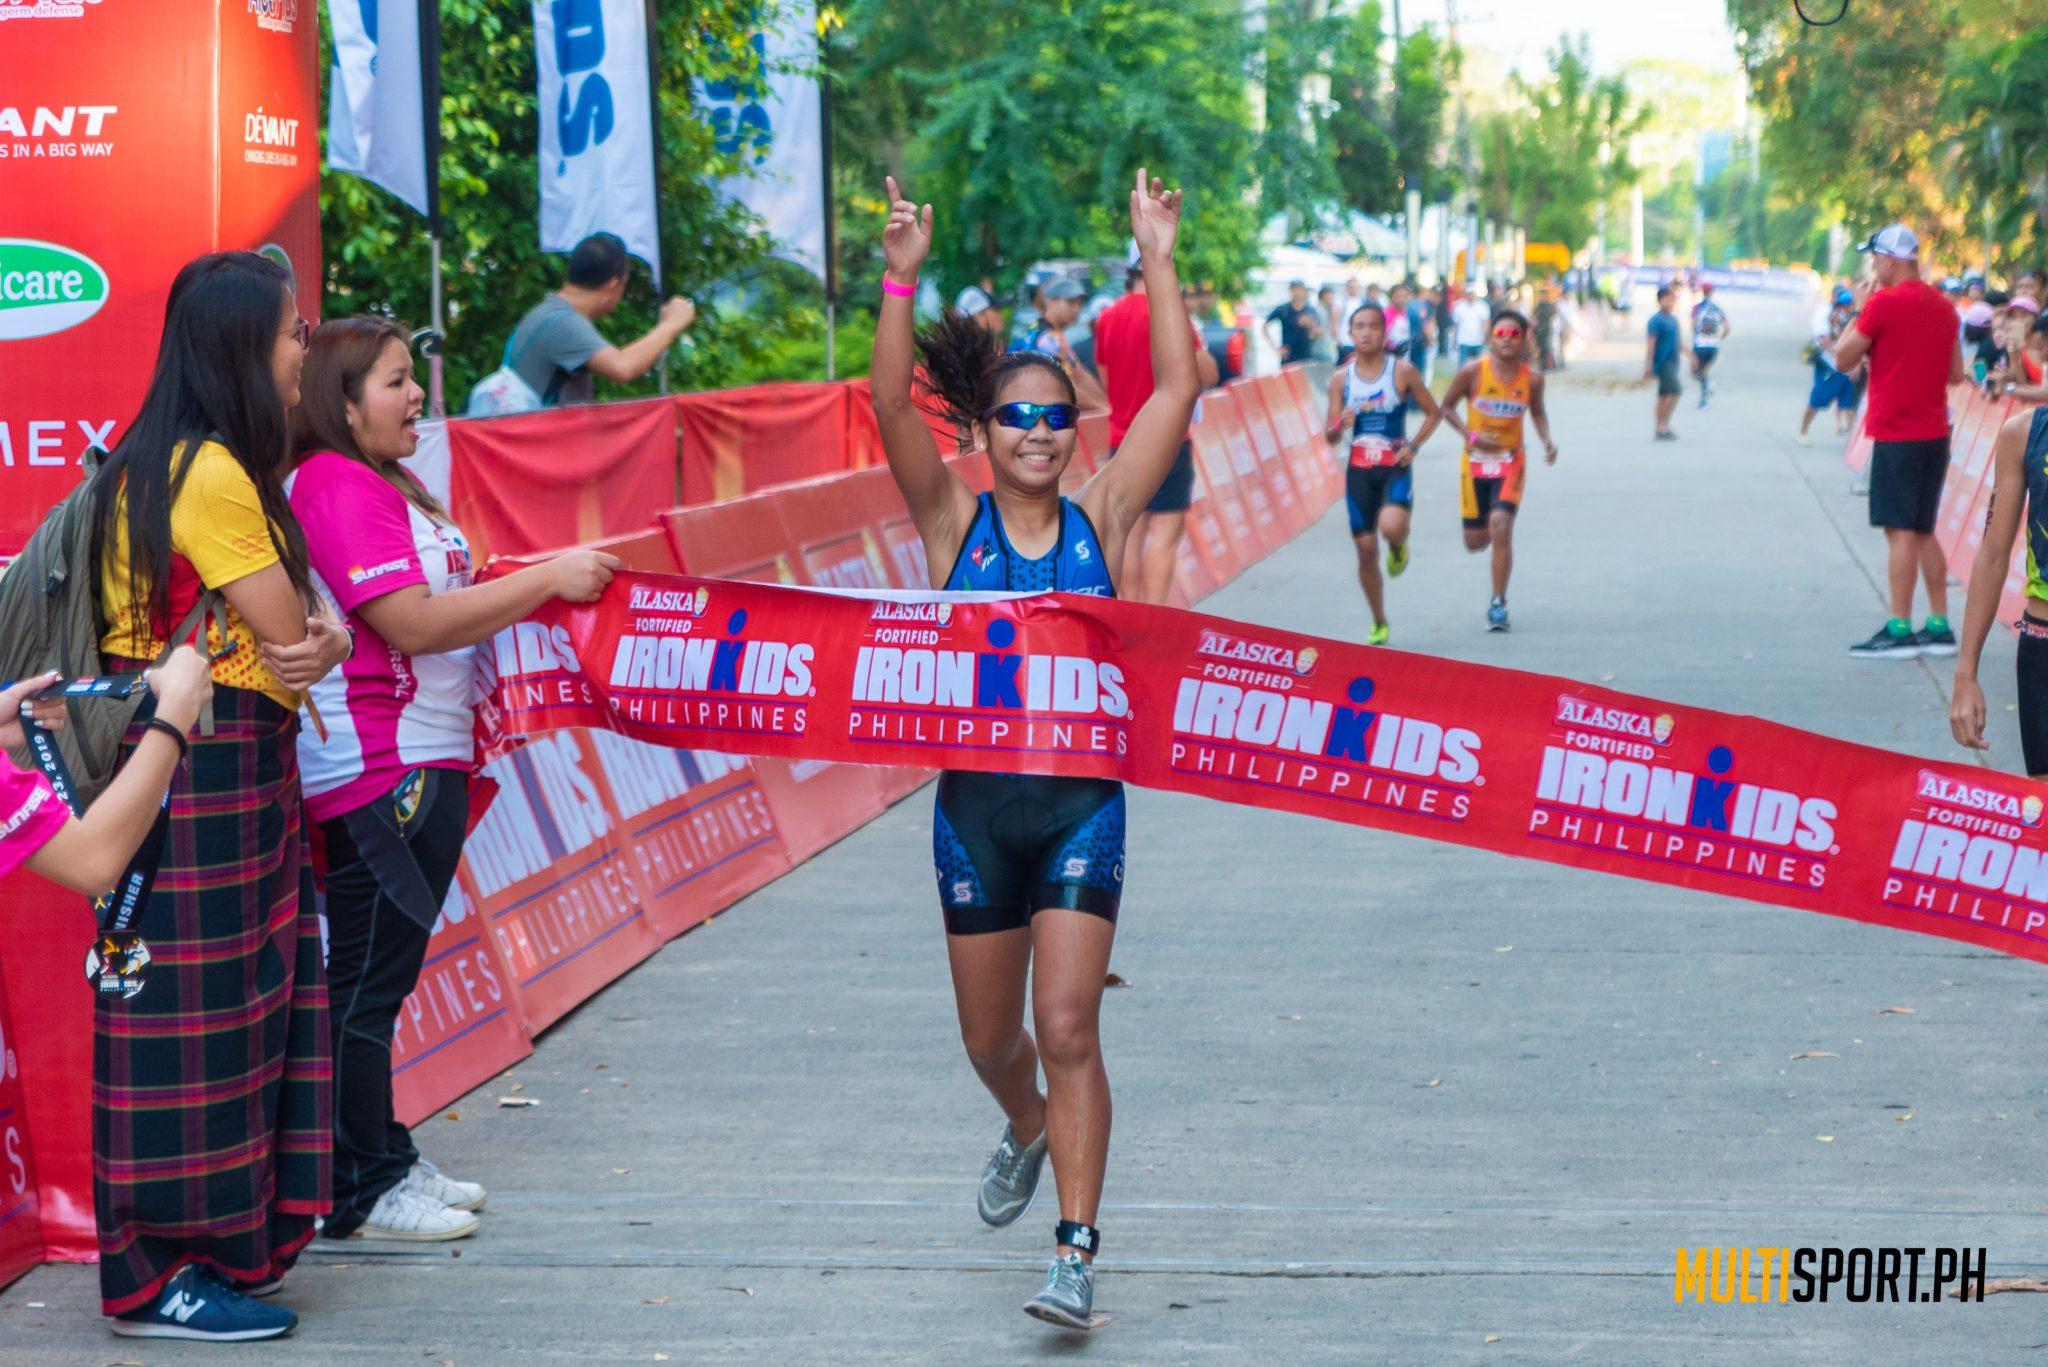 Marielle Estreba of the Cebu City Rider Omega Triathlon finished first in the female Alaska IronKids division